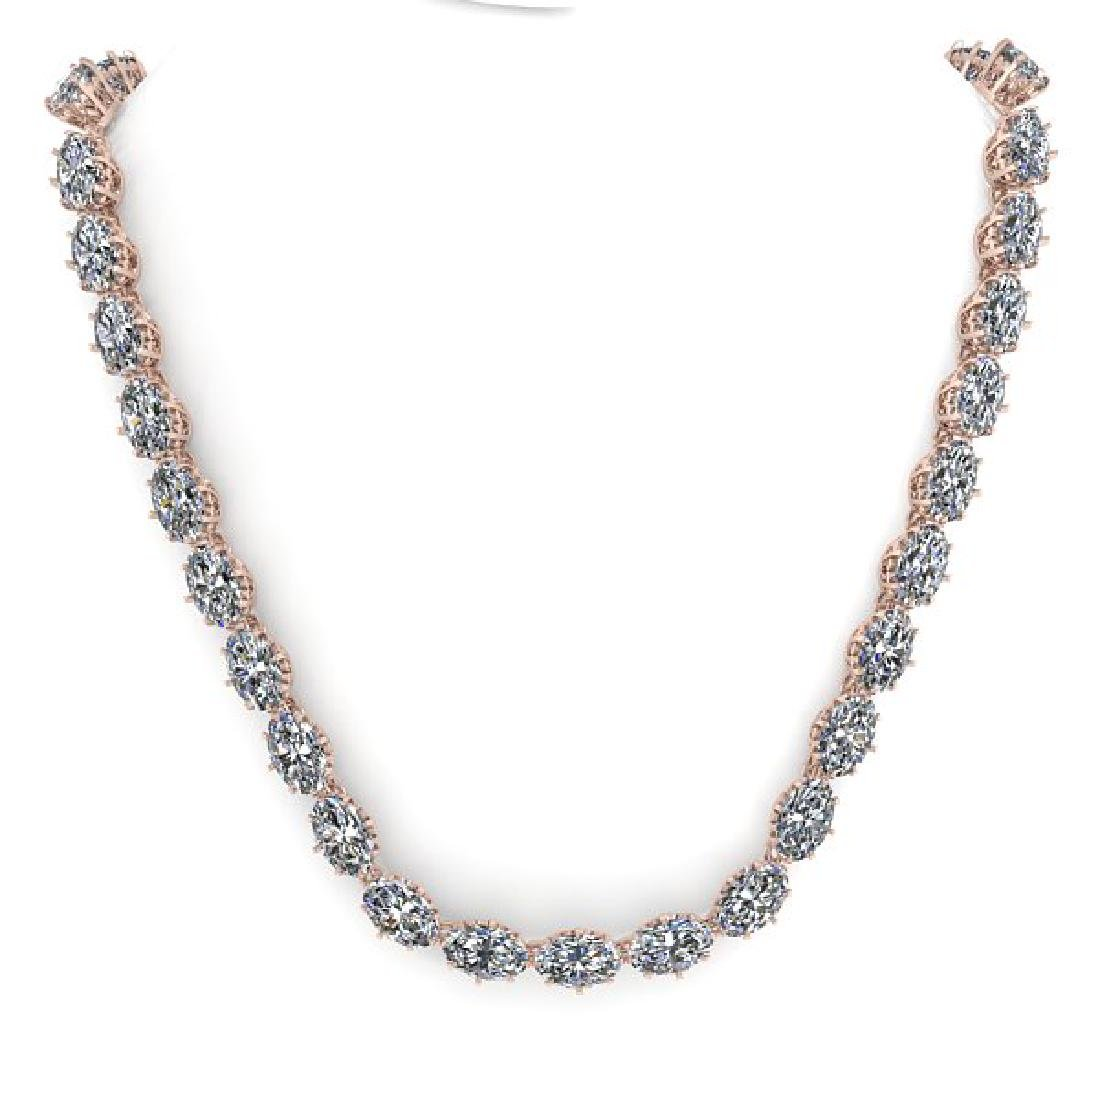 40 CTW Princess SI Certified Diamond Necklace 14K Rose - 3